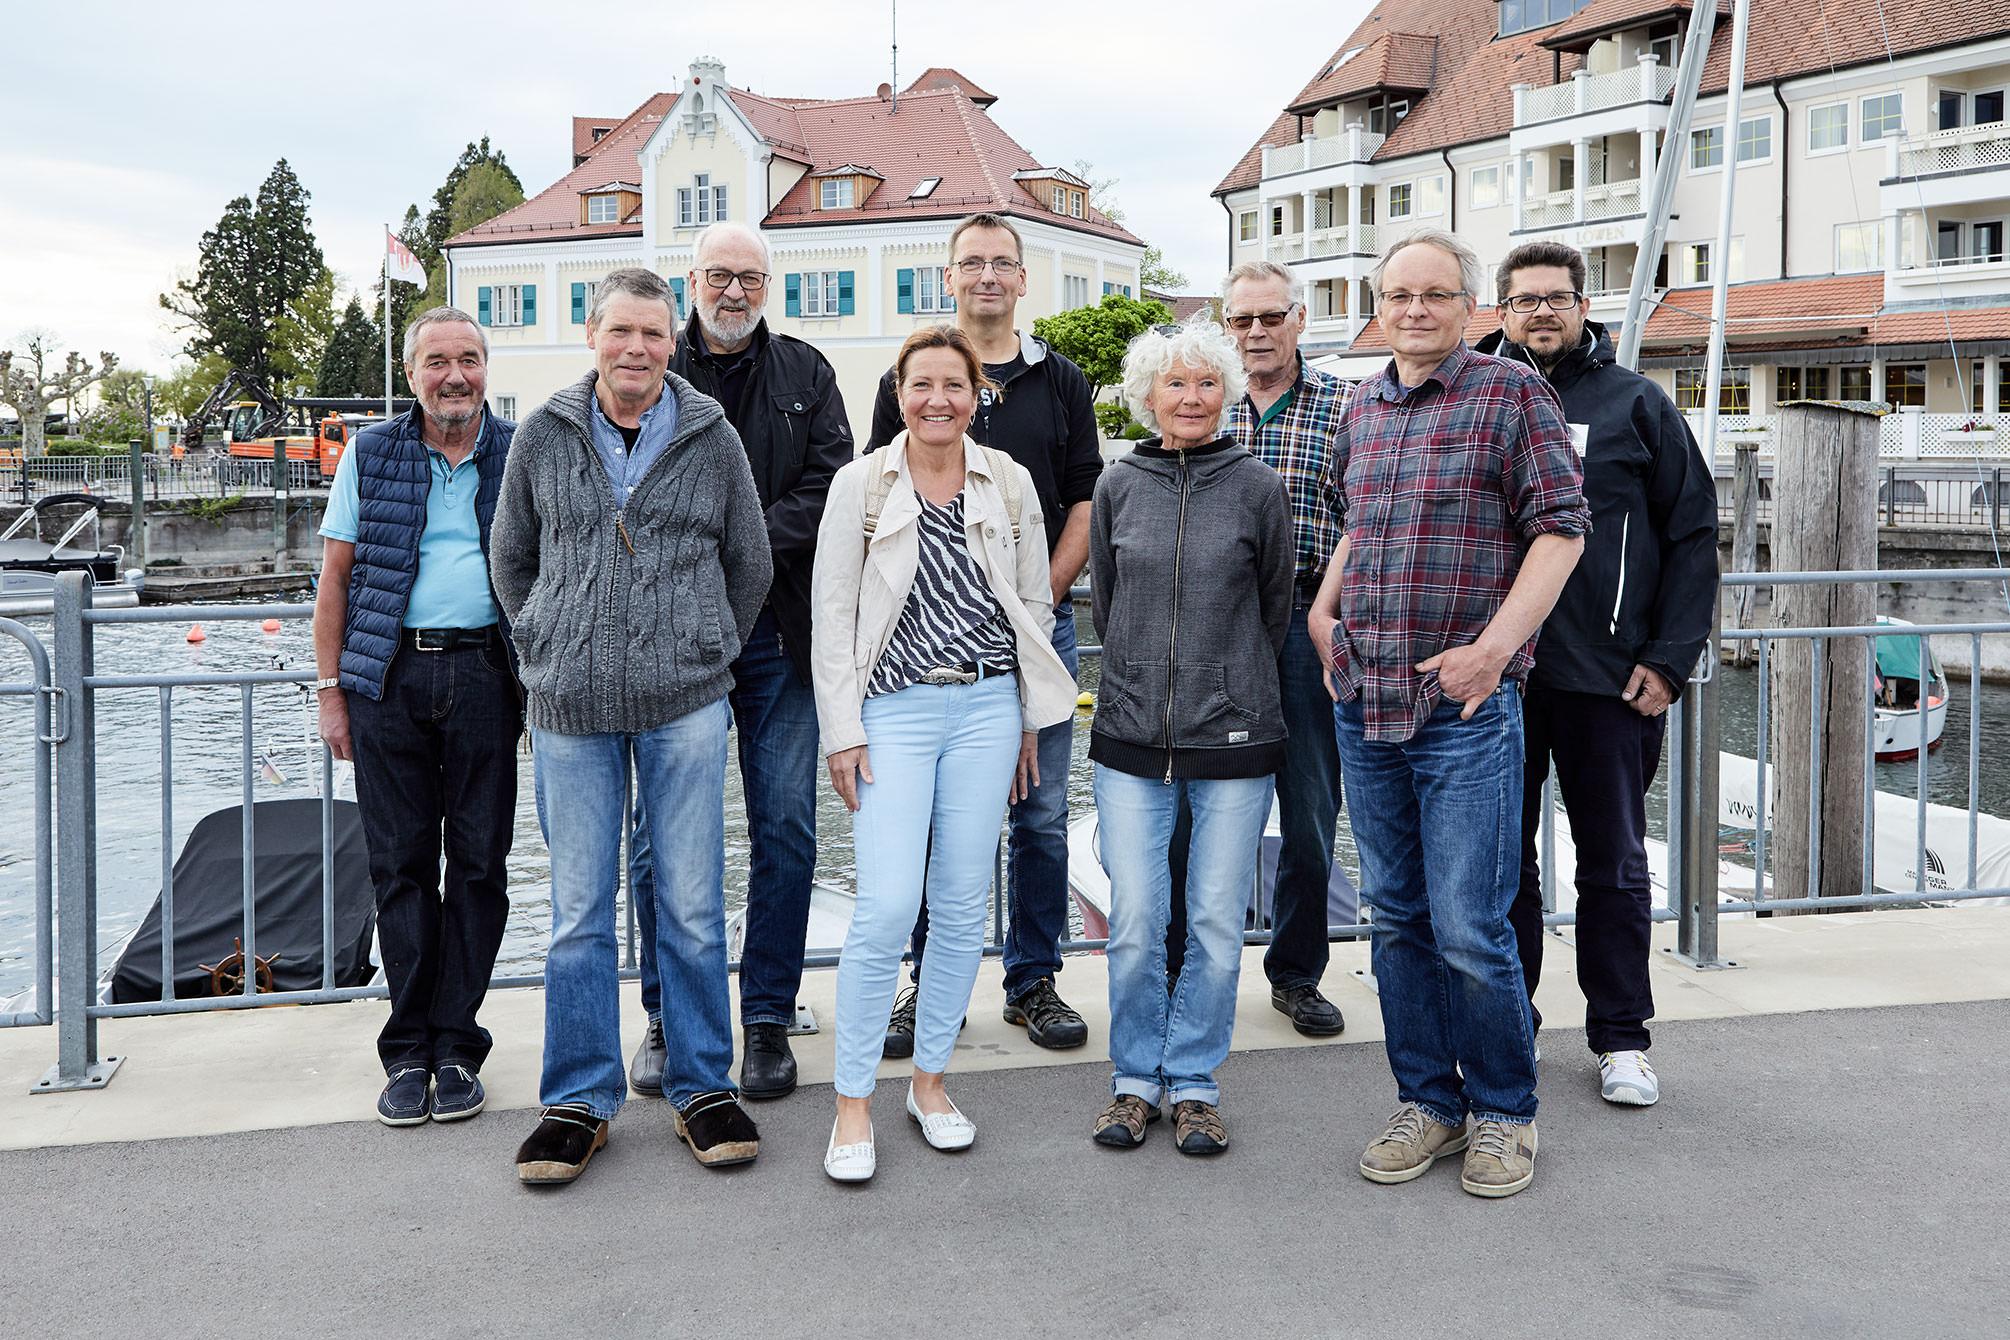 Gruppenbild der Gründungsmitglieder – Förderverein Fischereimuseum Langenargen e.V. April 2019